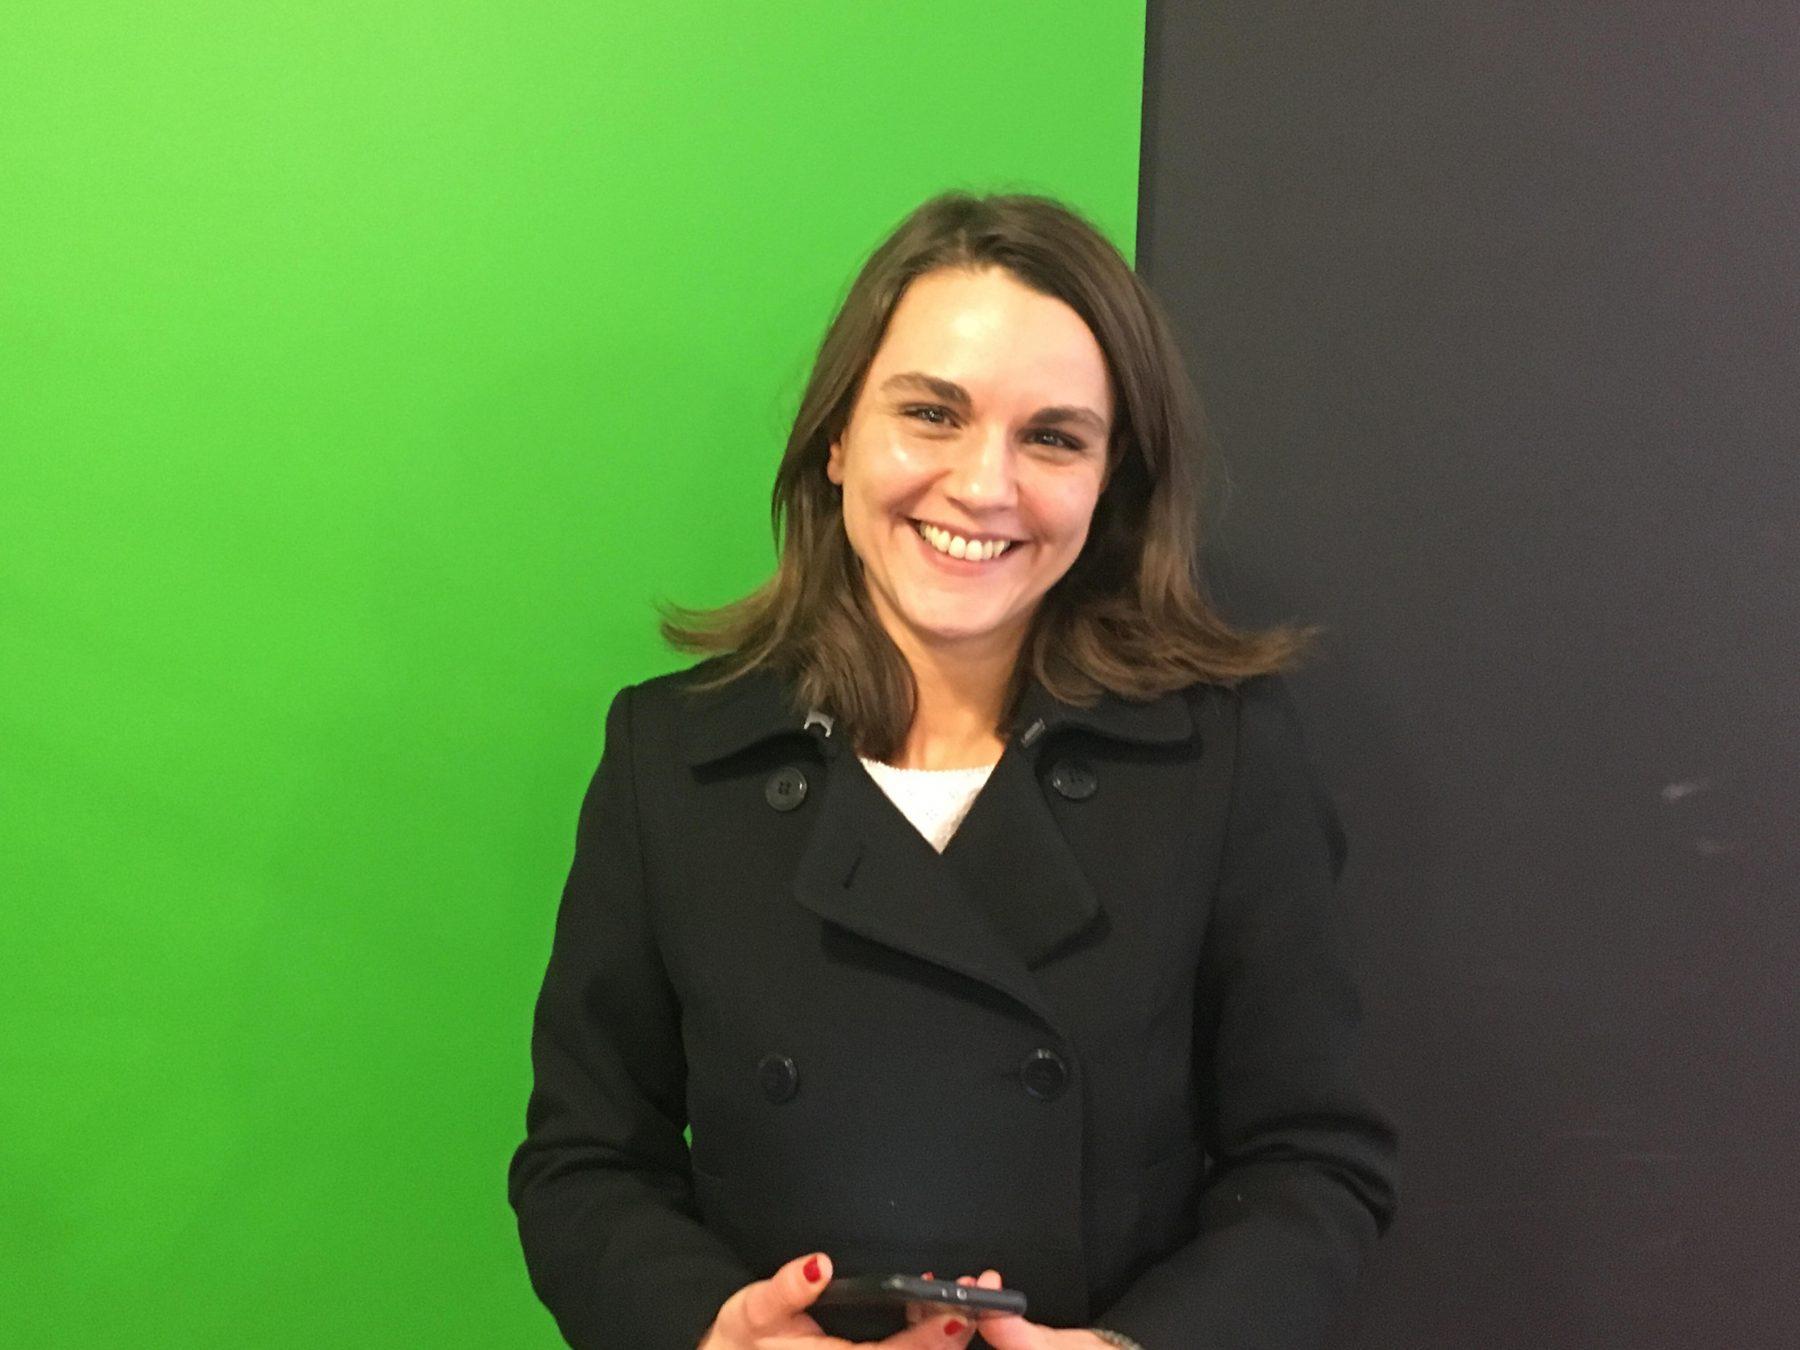 Interview : Nidia ALVANE, business Developer